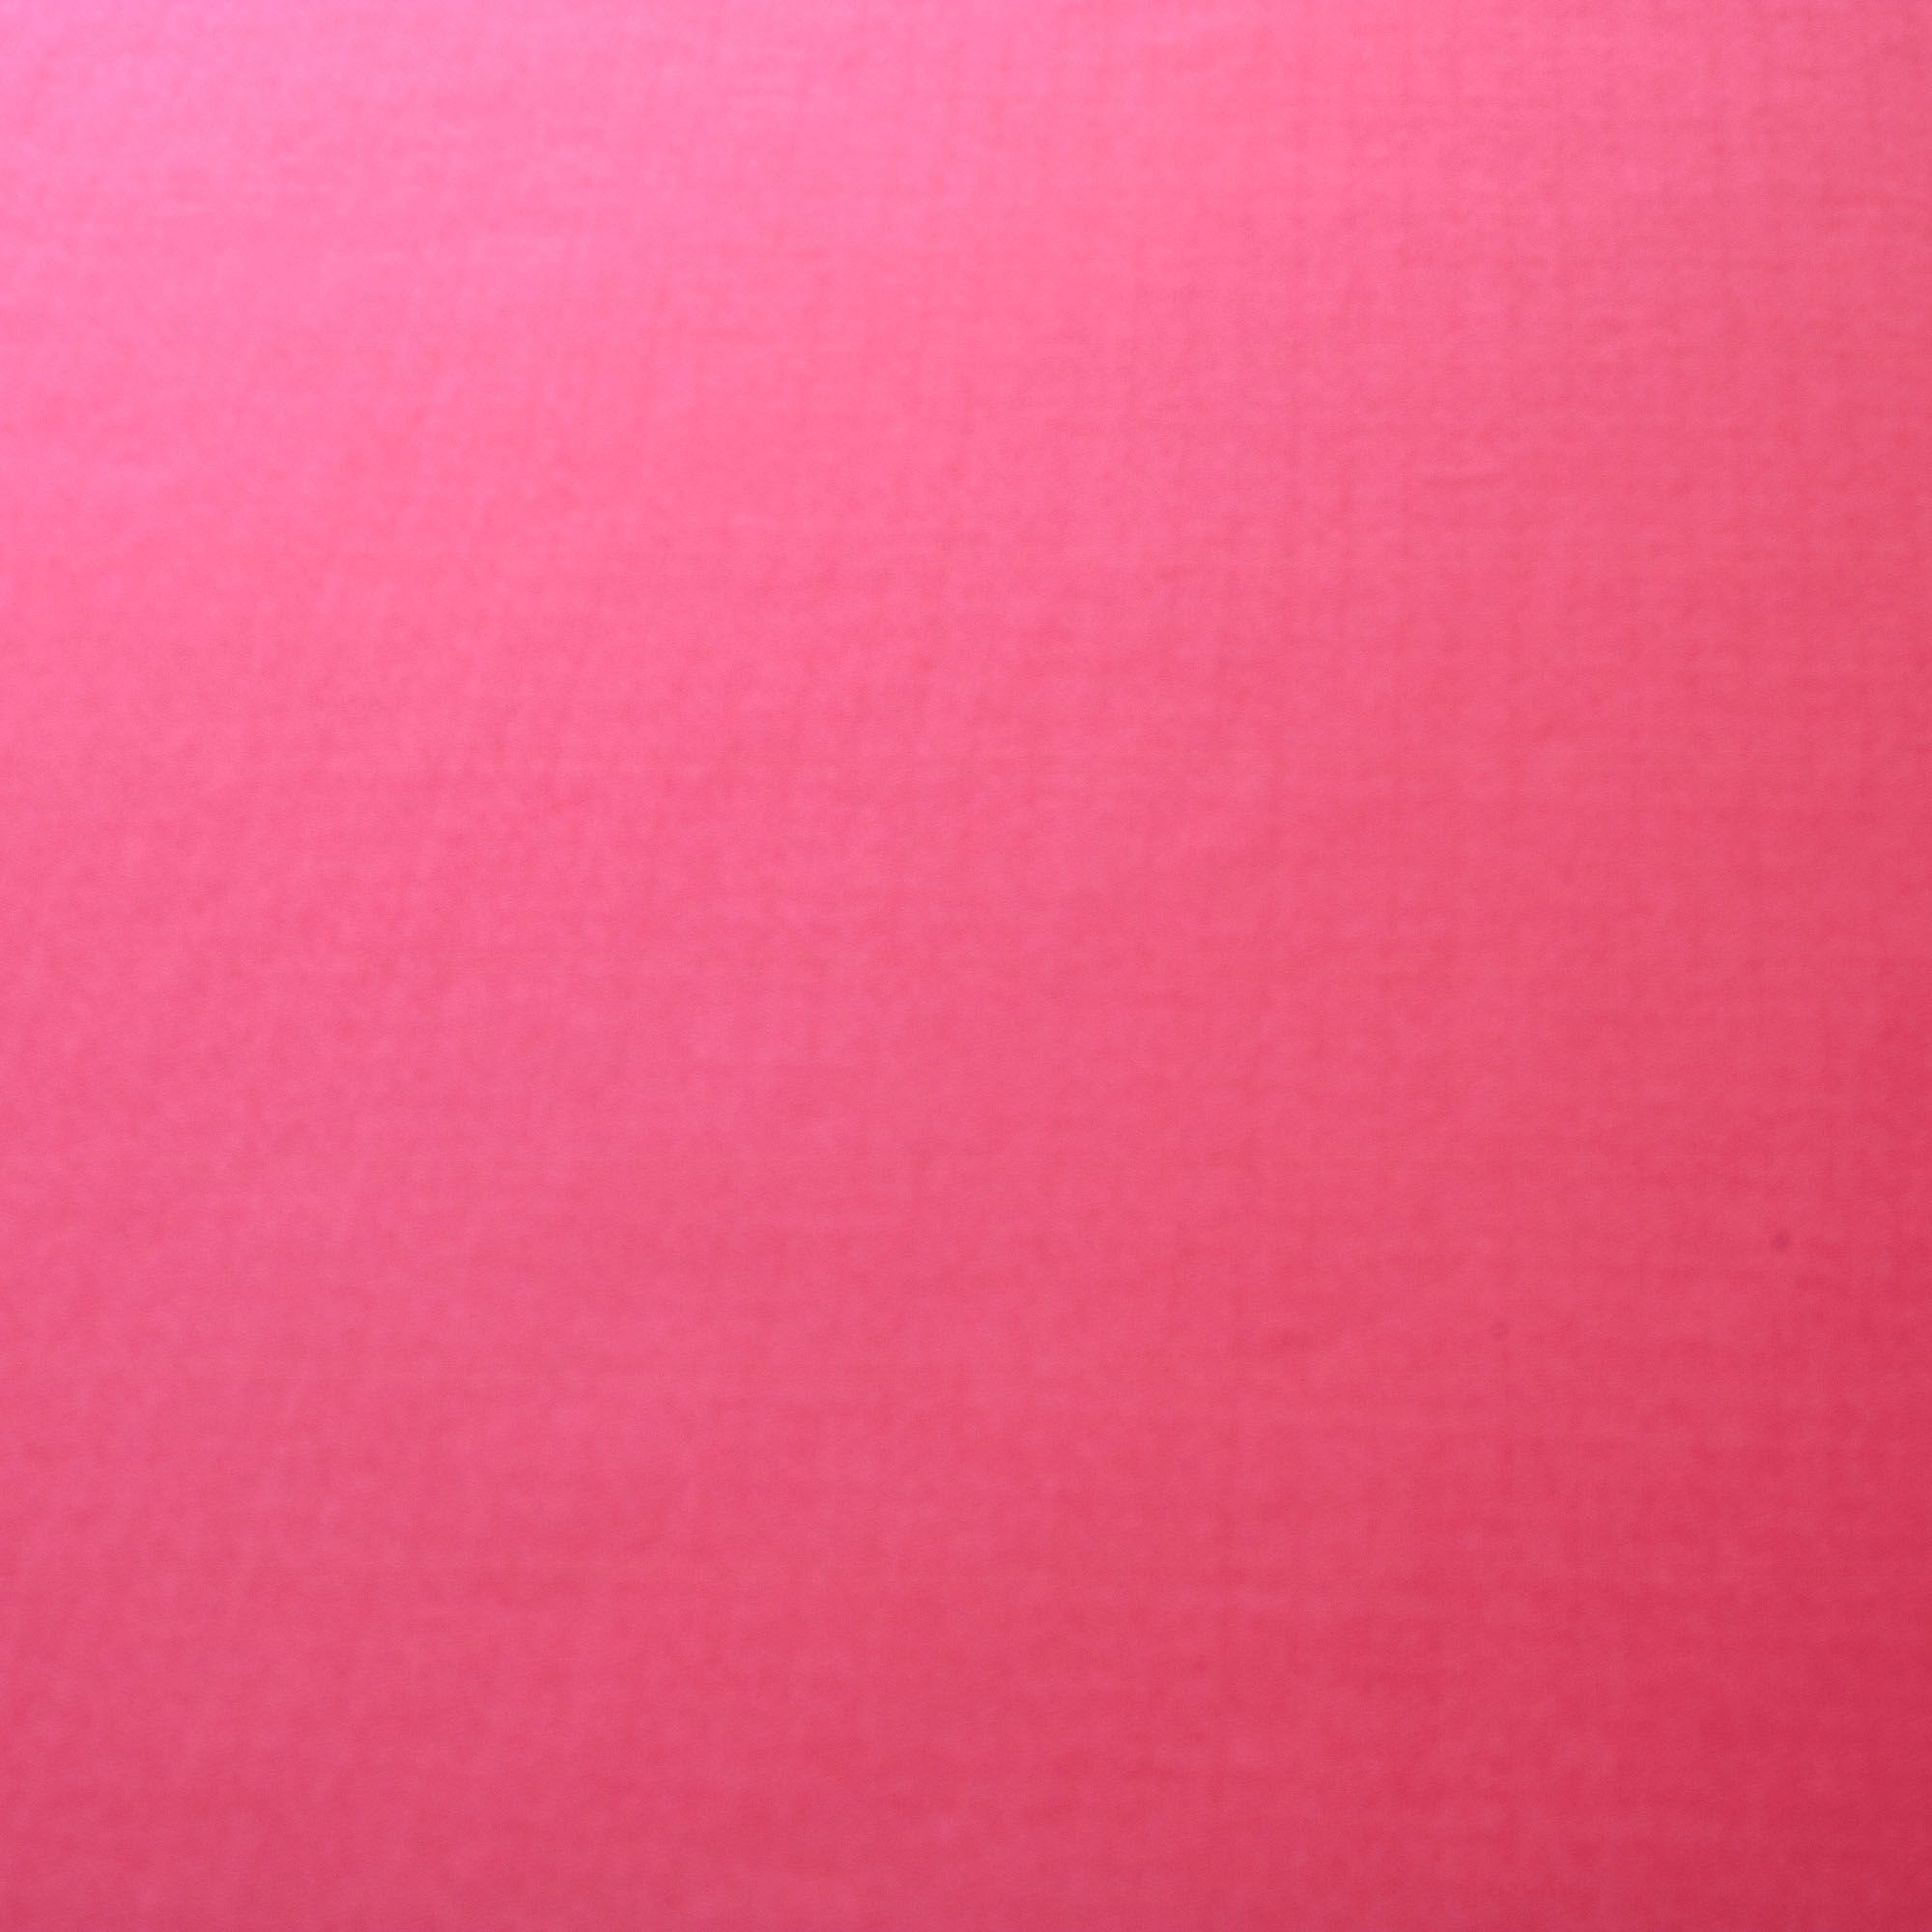 Tecido Malha para Forro Vermelho Goiaba 1,80 m Largura